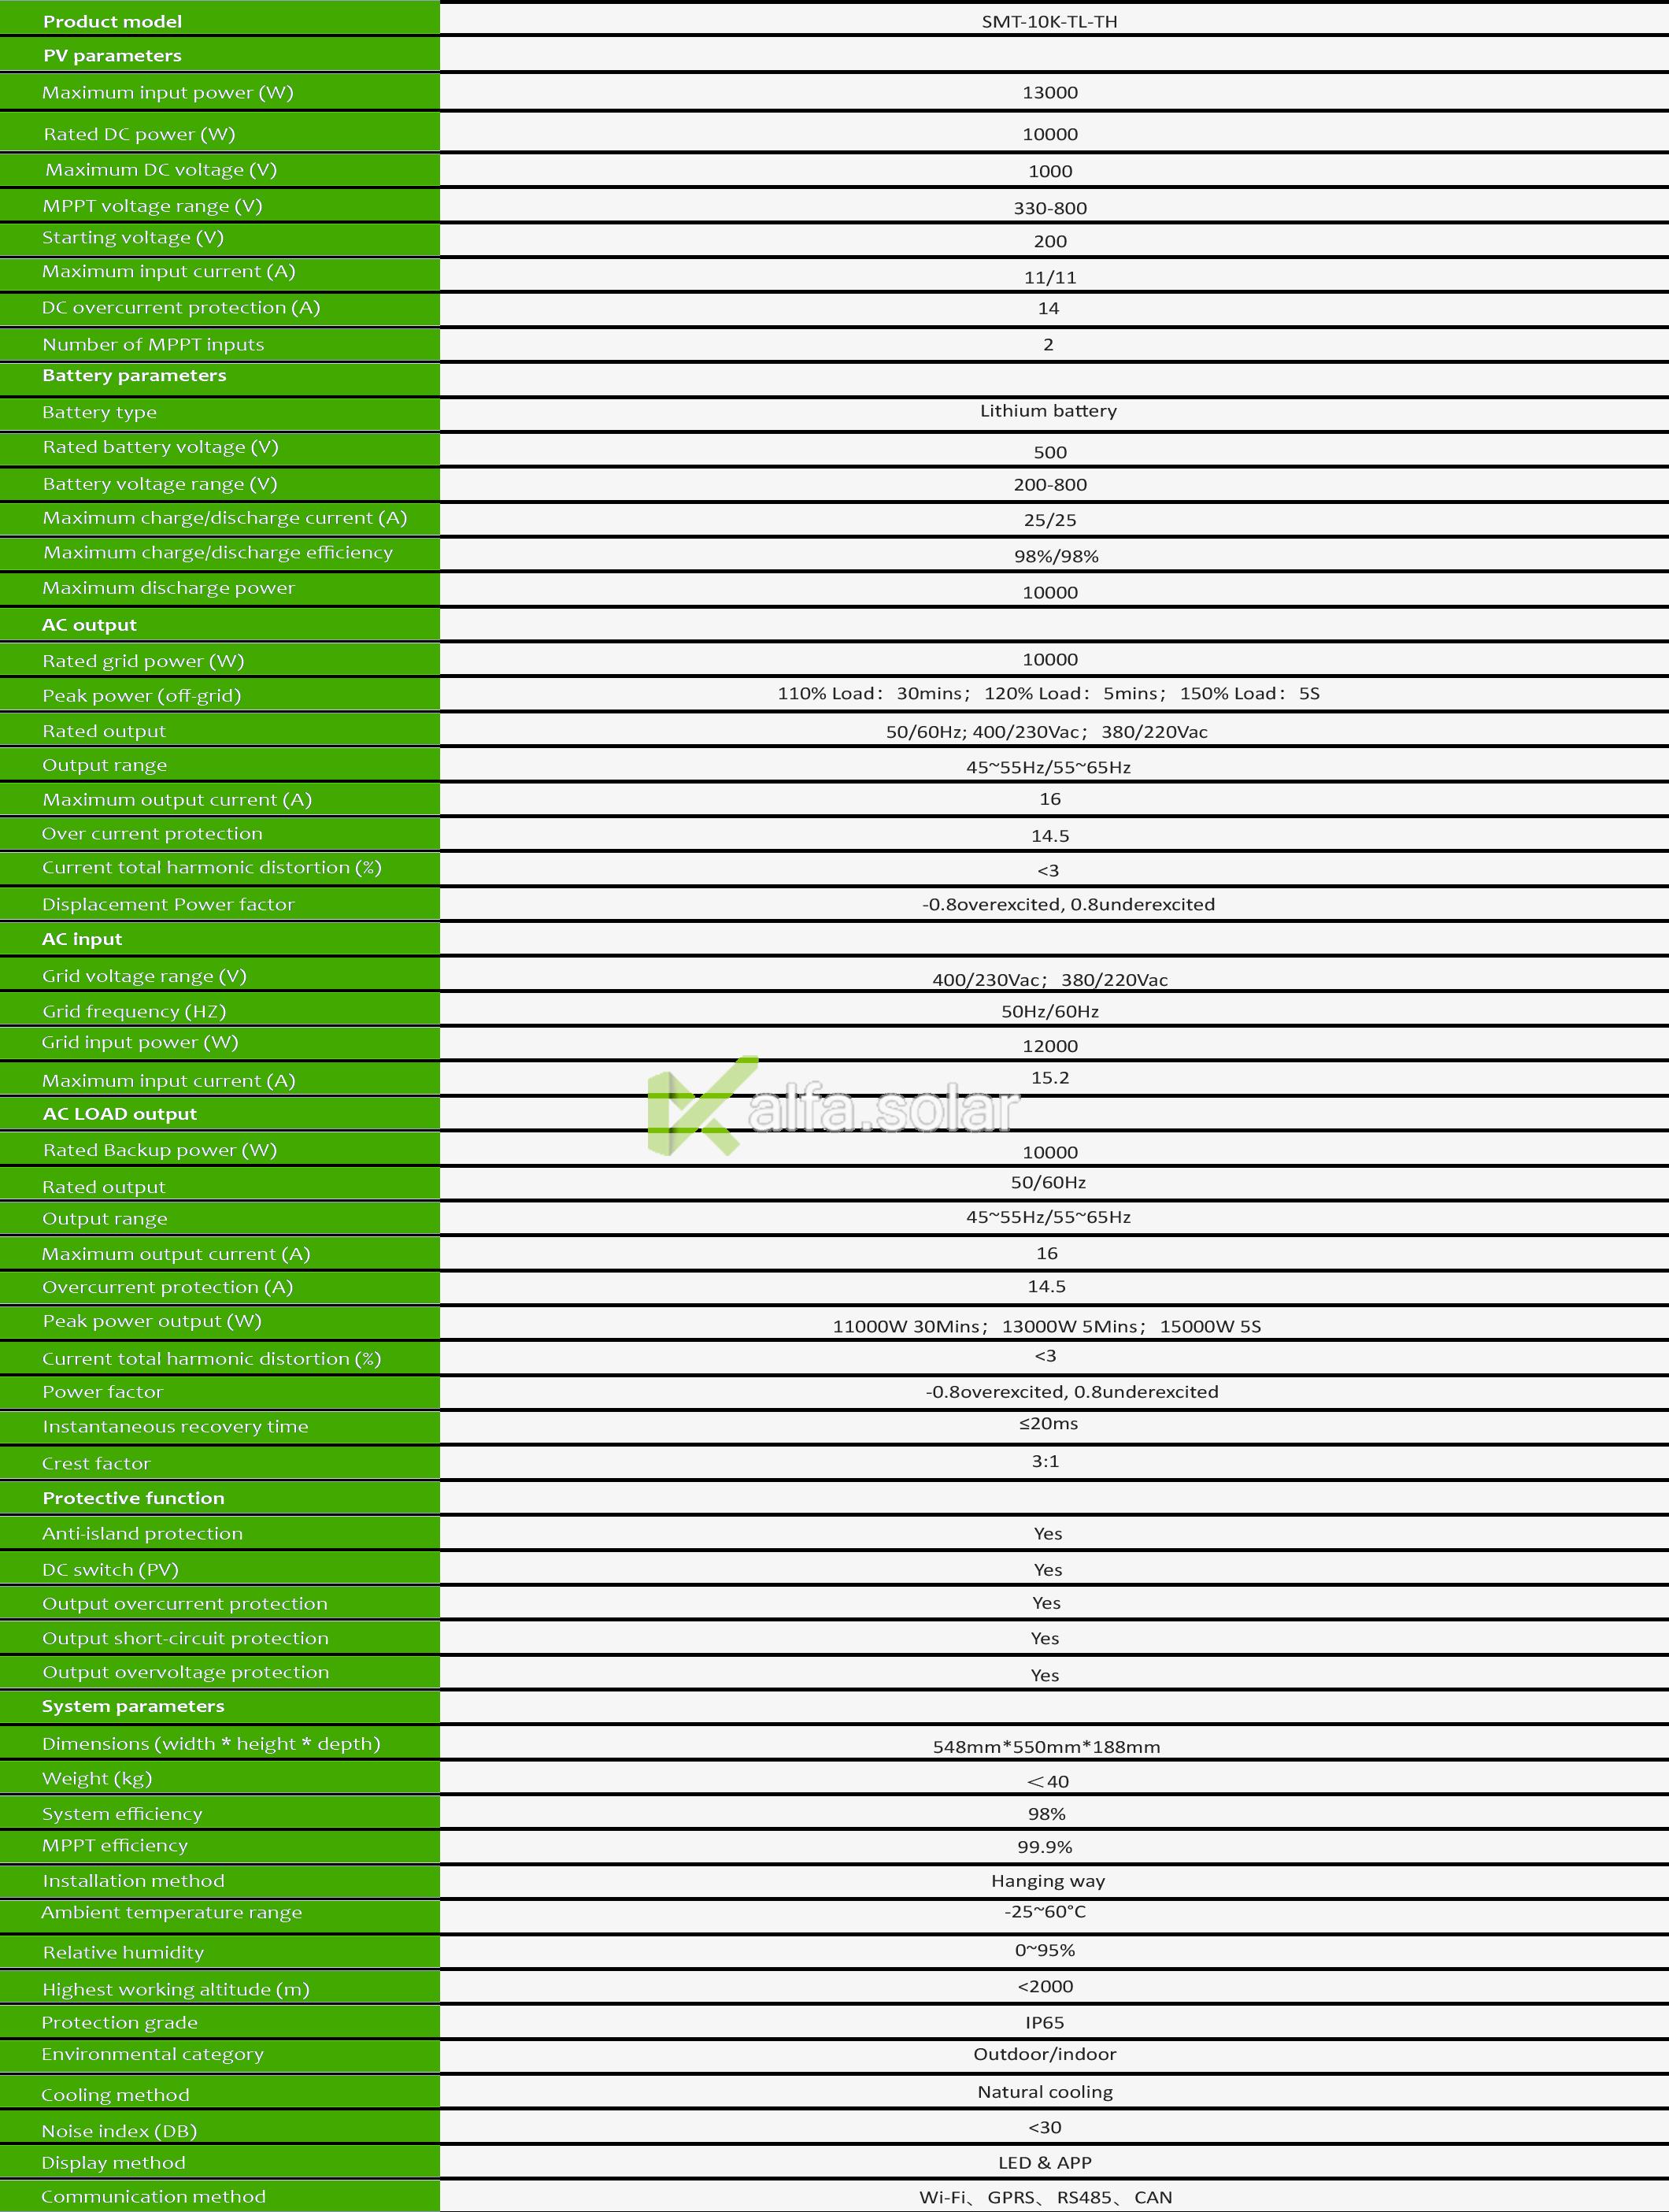 Sermatec SMT-10K-TH-HV